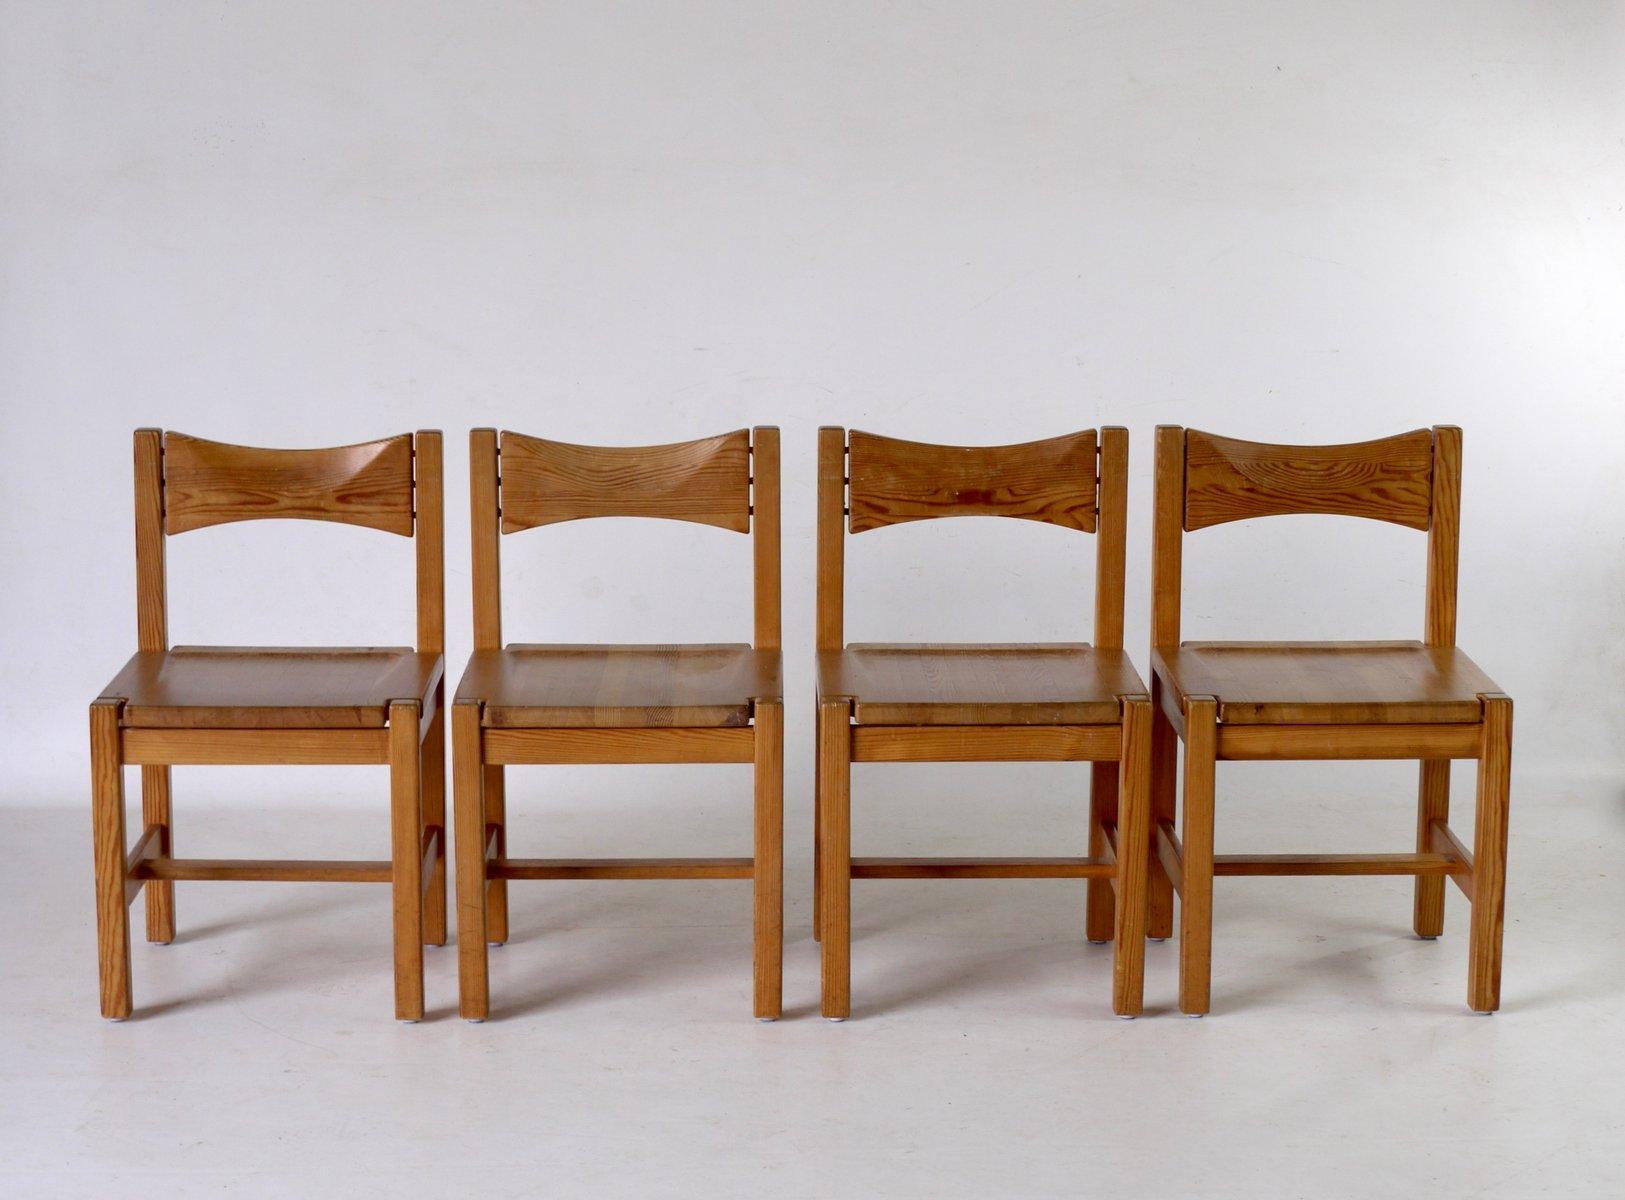 hongisto esszimmer st hle von illmari tapiovaara f r. Black Bedroom Furniture Sets. Home Design Ideas